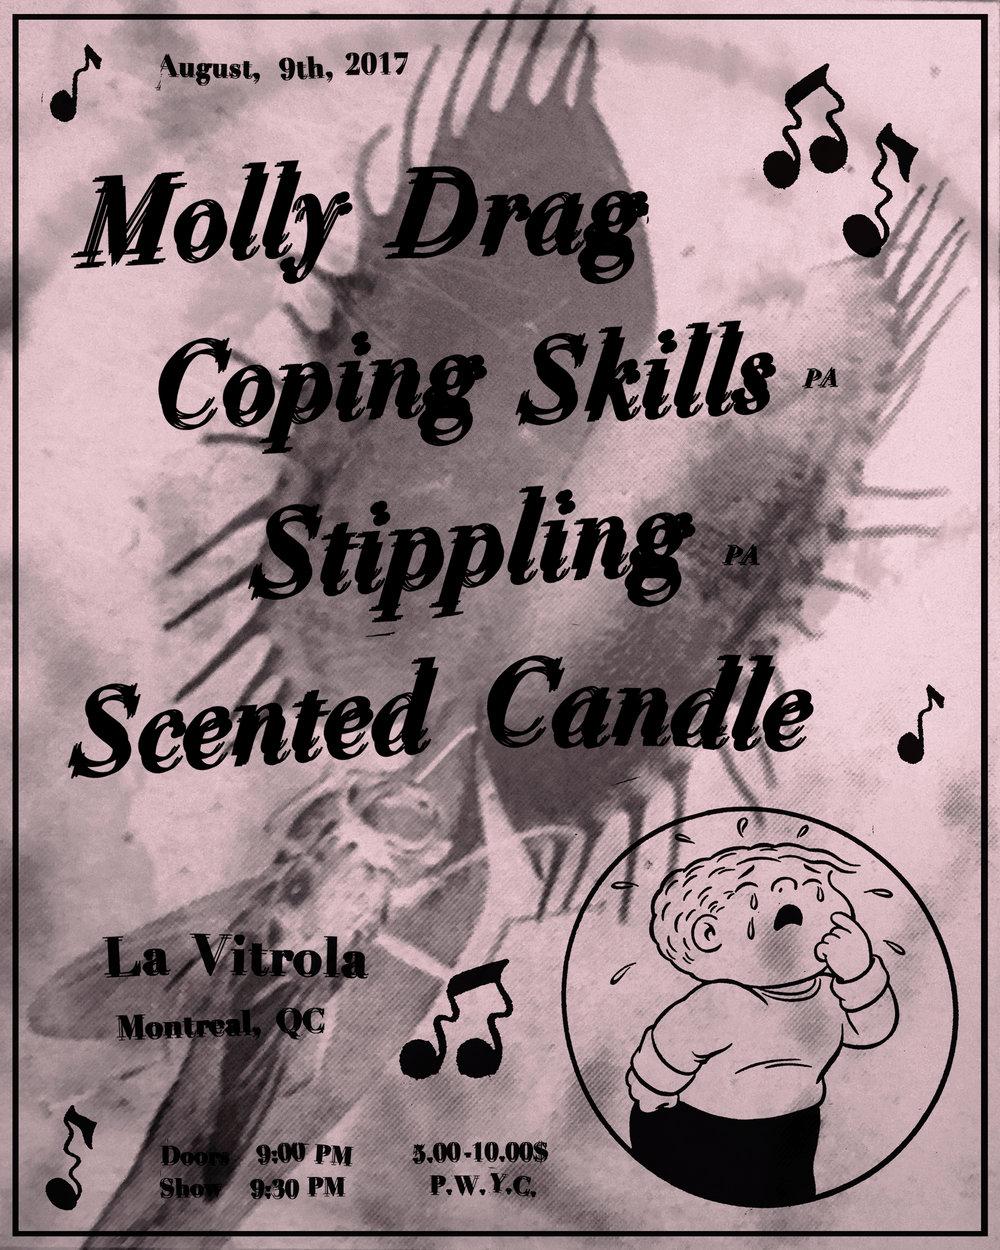 Flyer-MollyDrag89-BWPinks2 copy.jpg